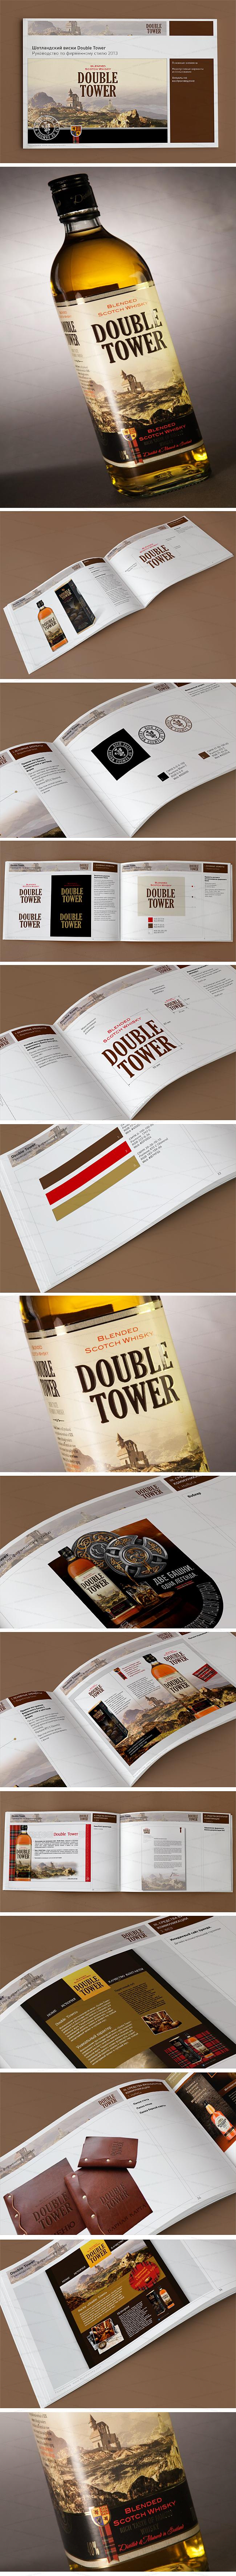 Identity-DoubleTower